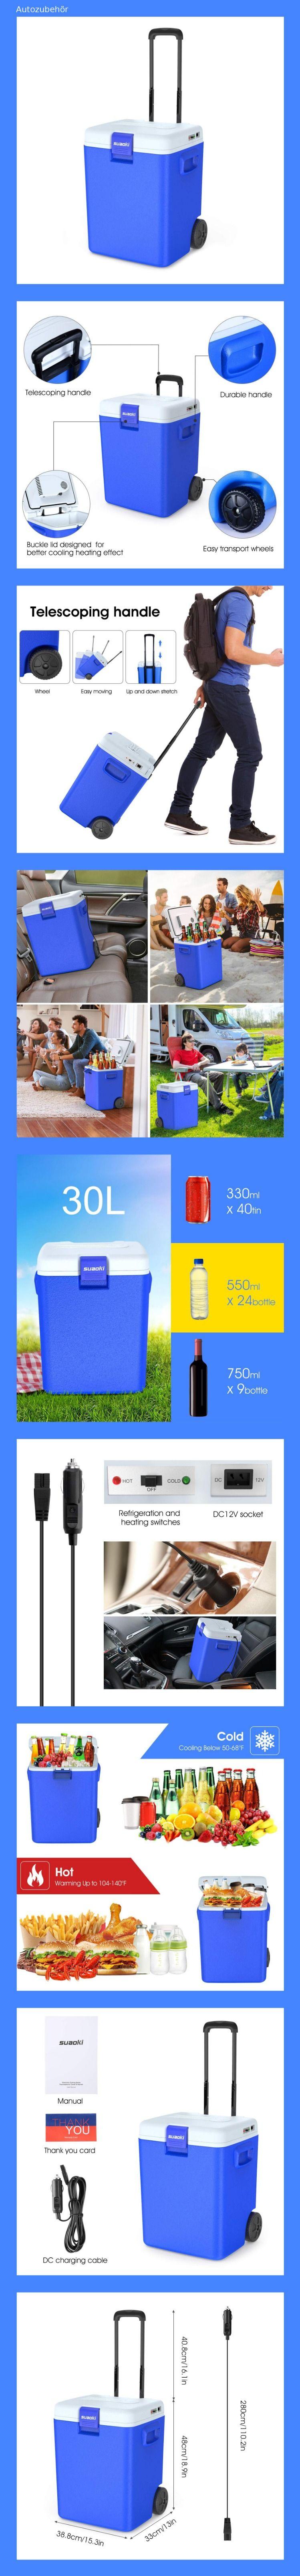 Suaoki Kuhlbox 30 Liter Ac Dc Thermo Elektrische Tragbare Kuhlbox